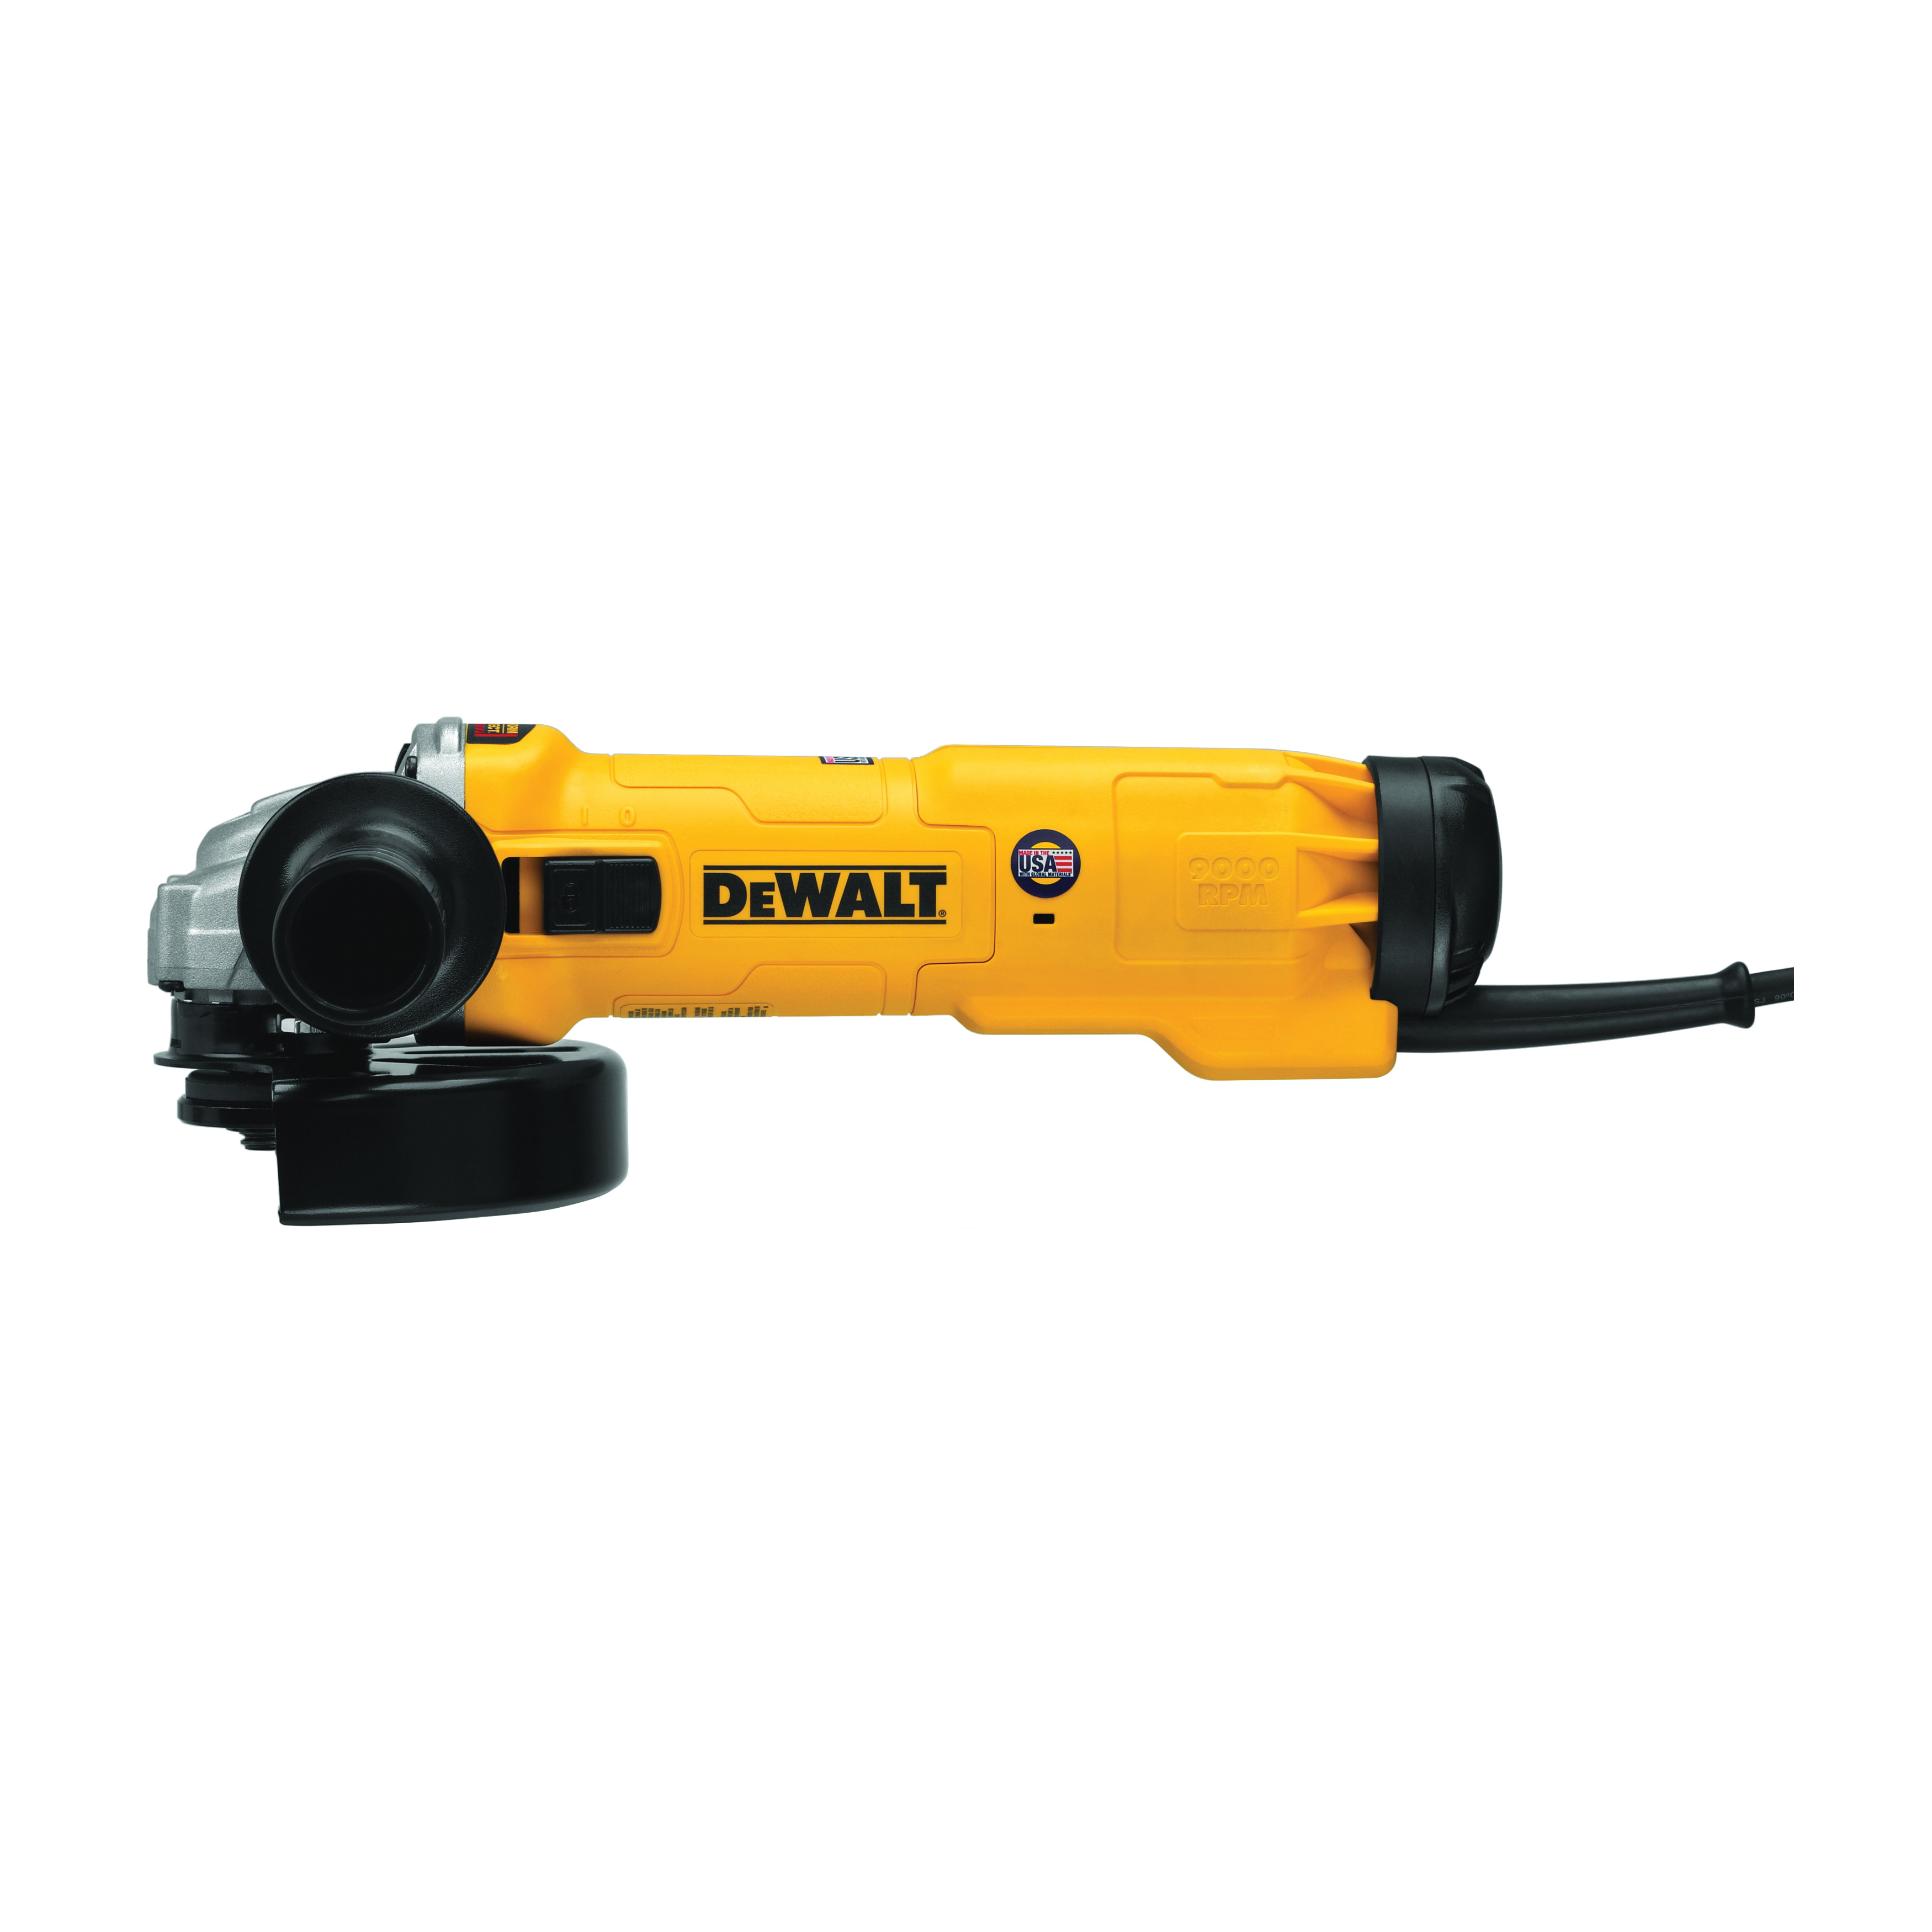 DeWALT® DWE43140 Heavy Duty High Performance Small Angle Grinder, 6 in Dia Wheel, 5/8-11 Arbor/Shank, 120 VAC, Black/Yellow, Yes, Slide Switch